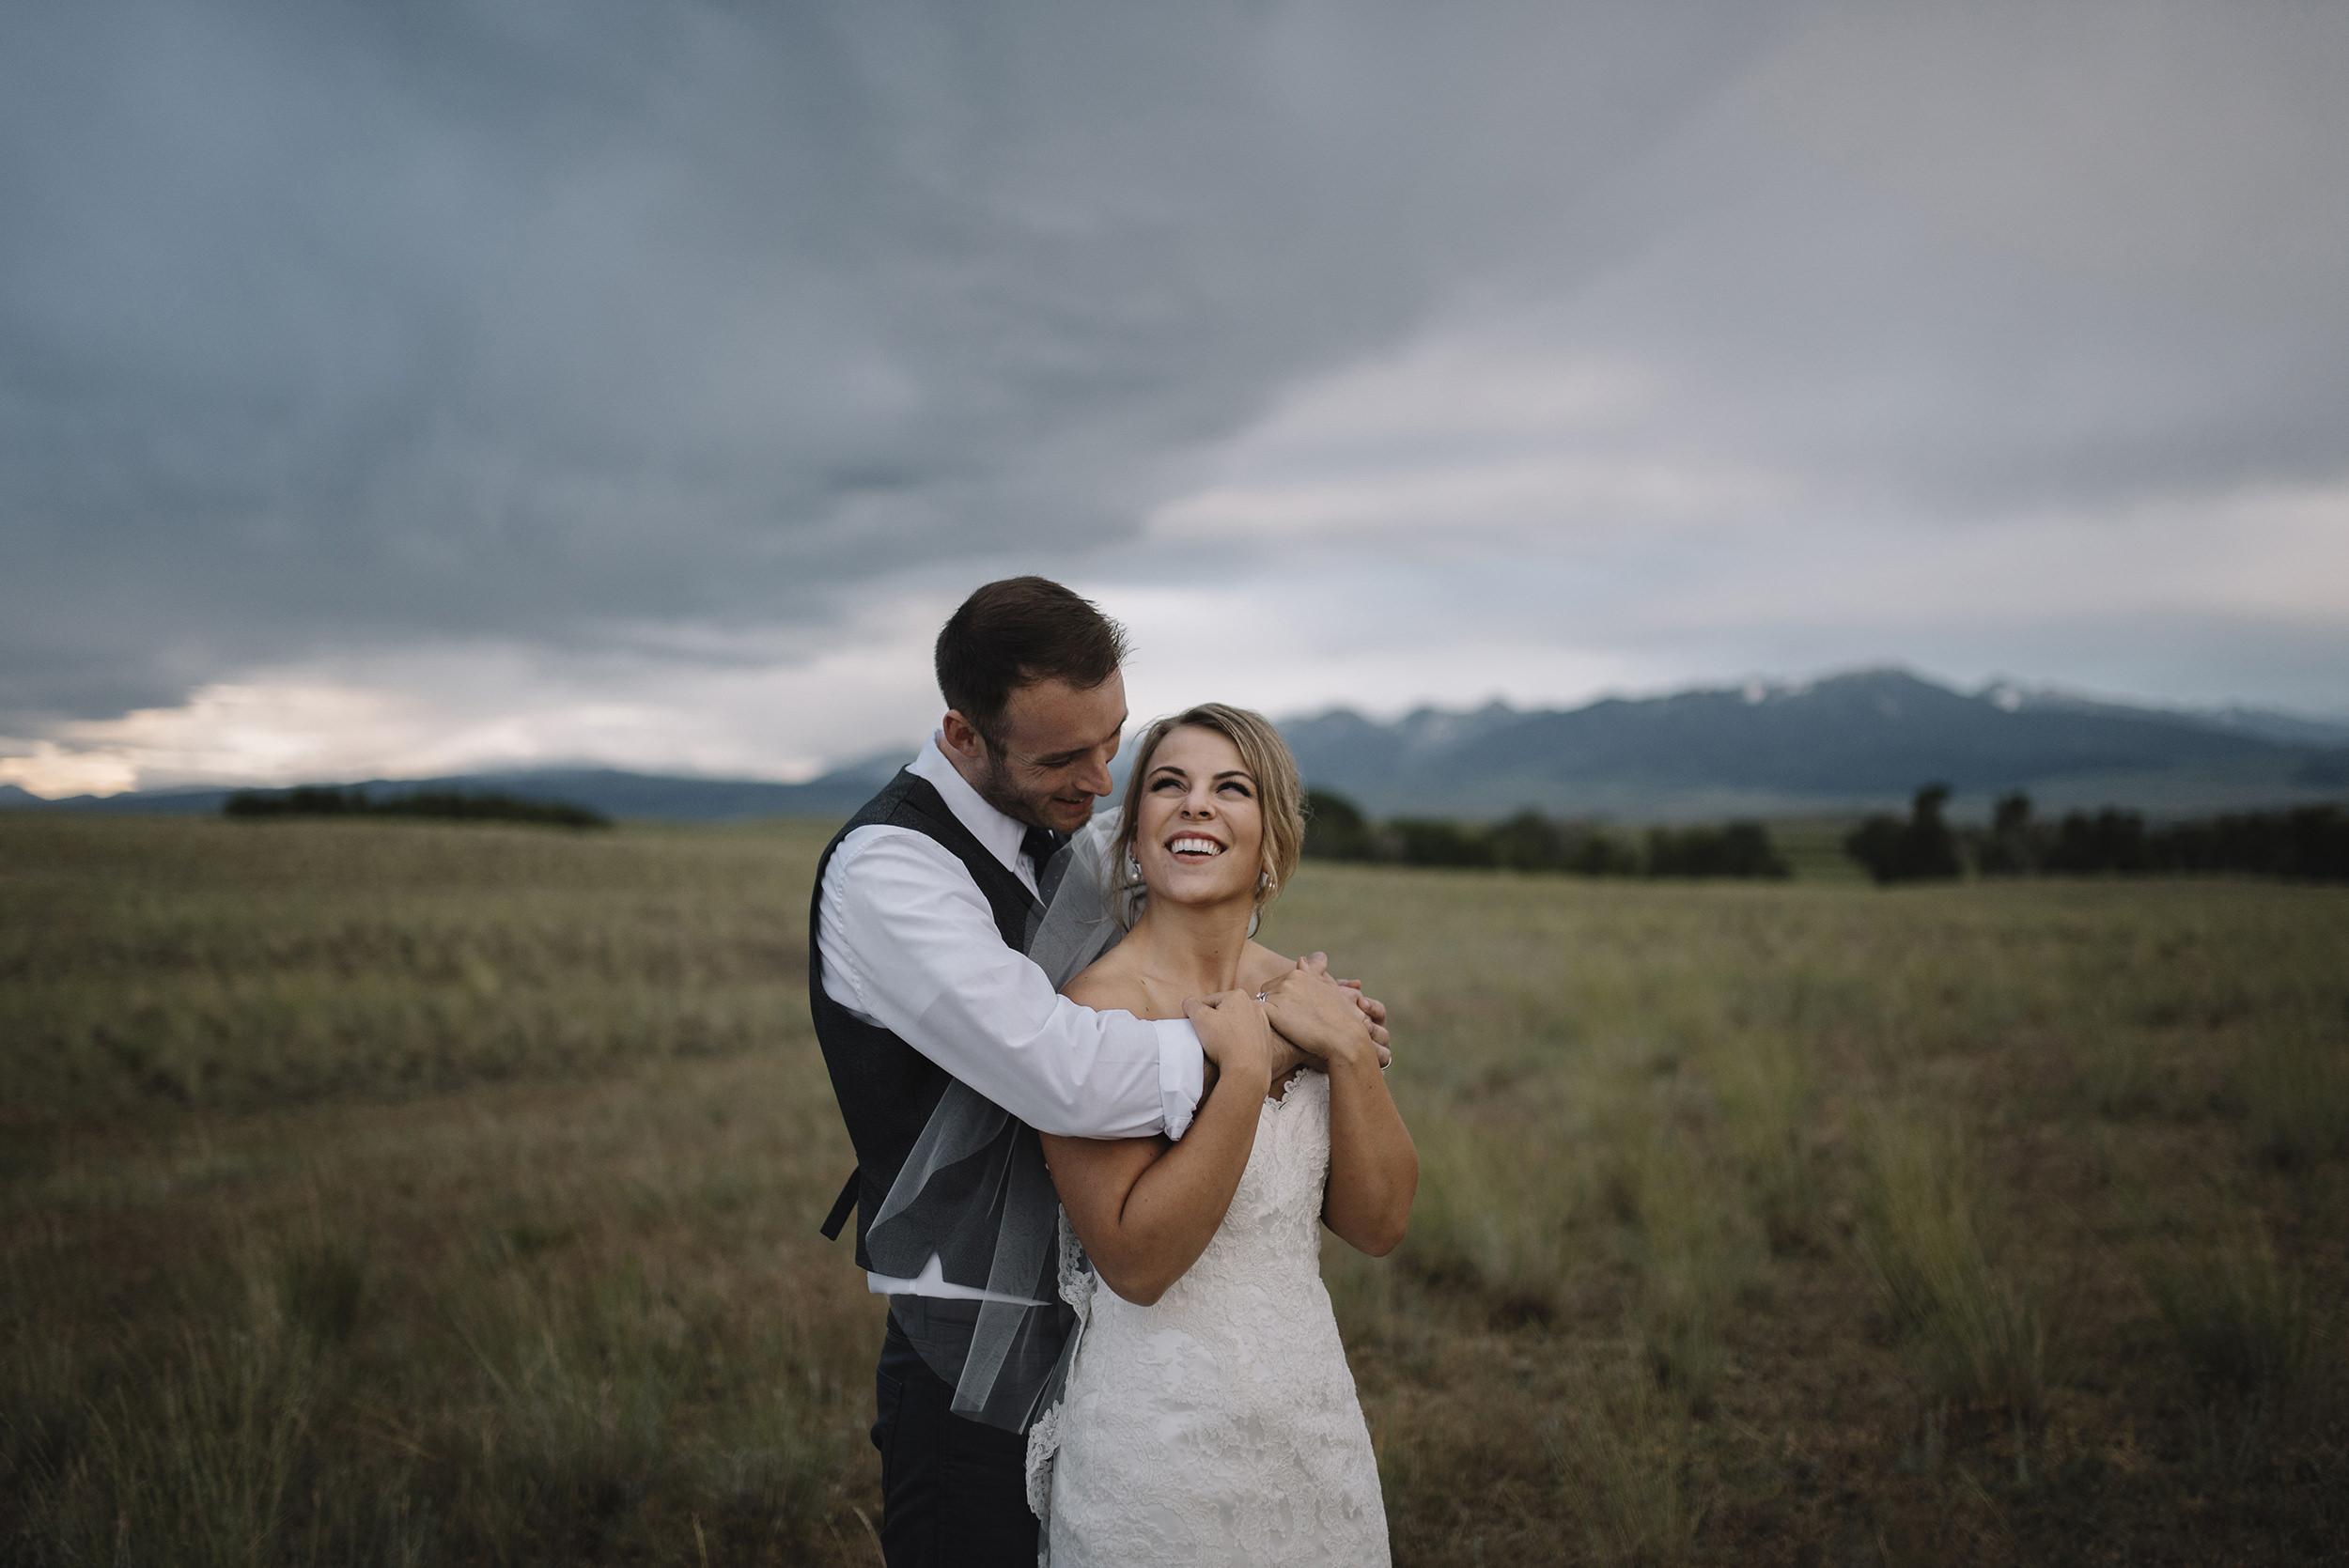 Colby-and-Jess-Intimate-Backyard-Wedding-Bozeman-Montana172.jpg